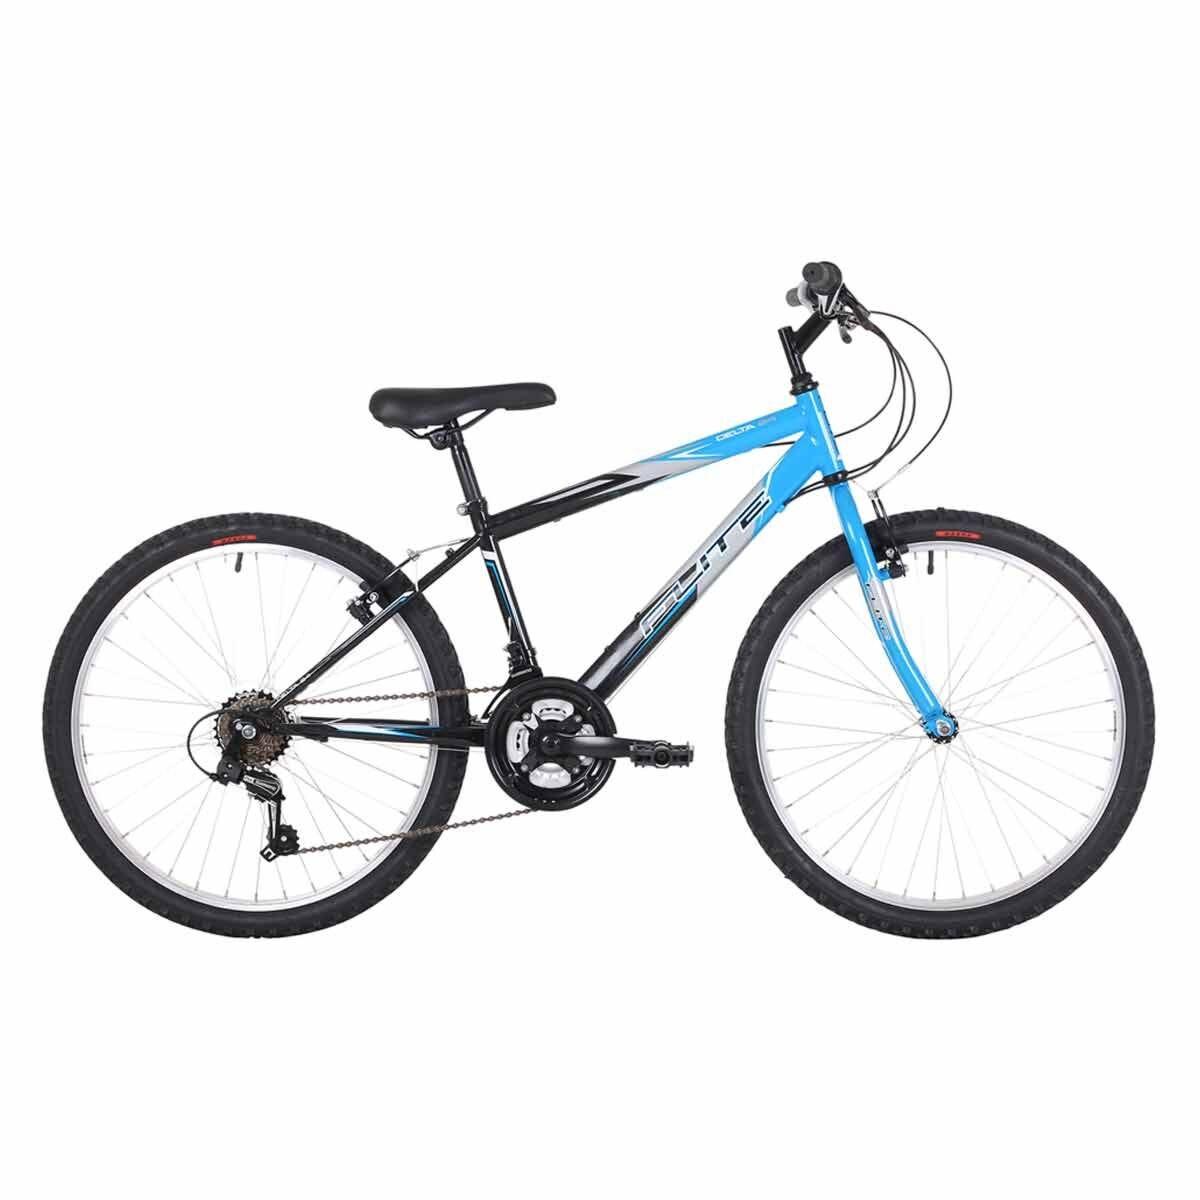 Flite Delta Kids Mountain Bike 24 Inch Wheel